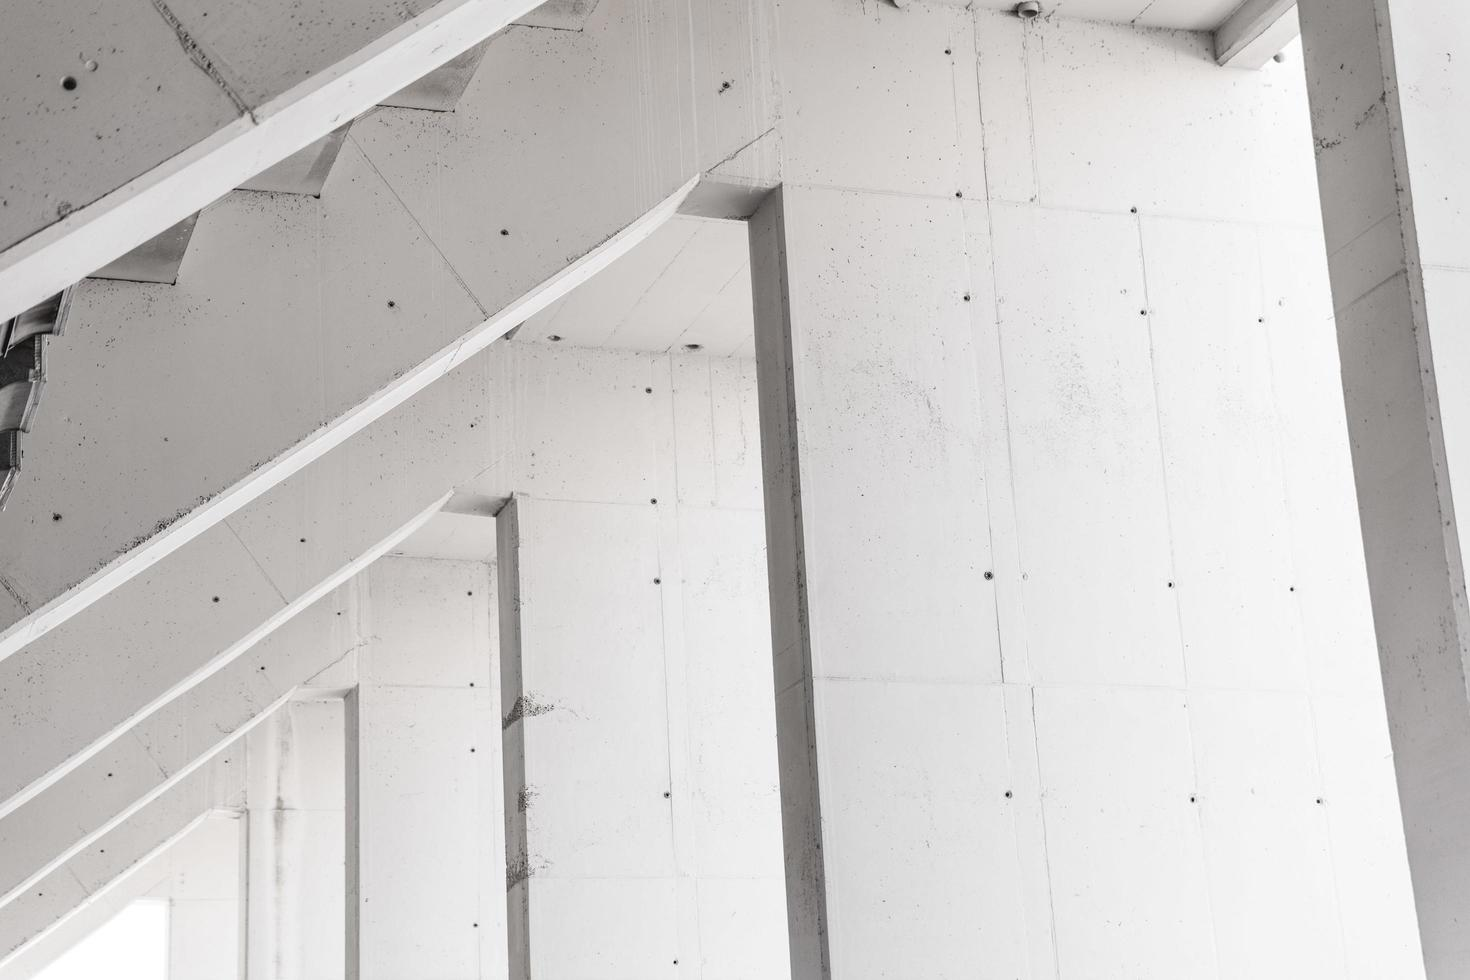 mur peint en blanc photo